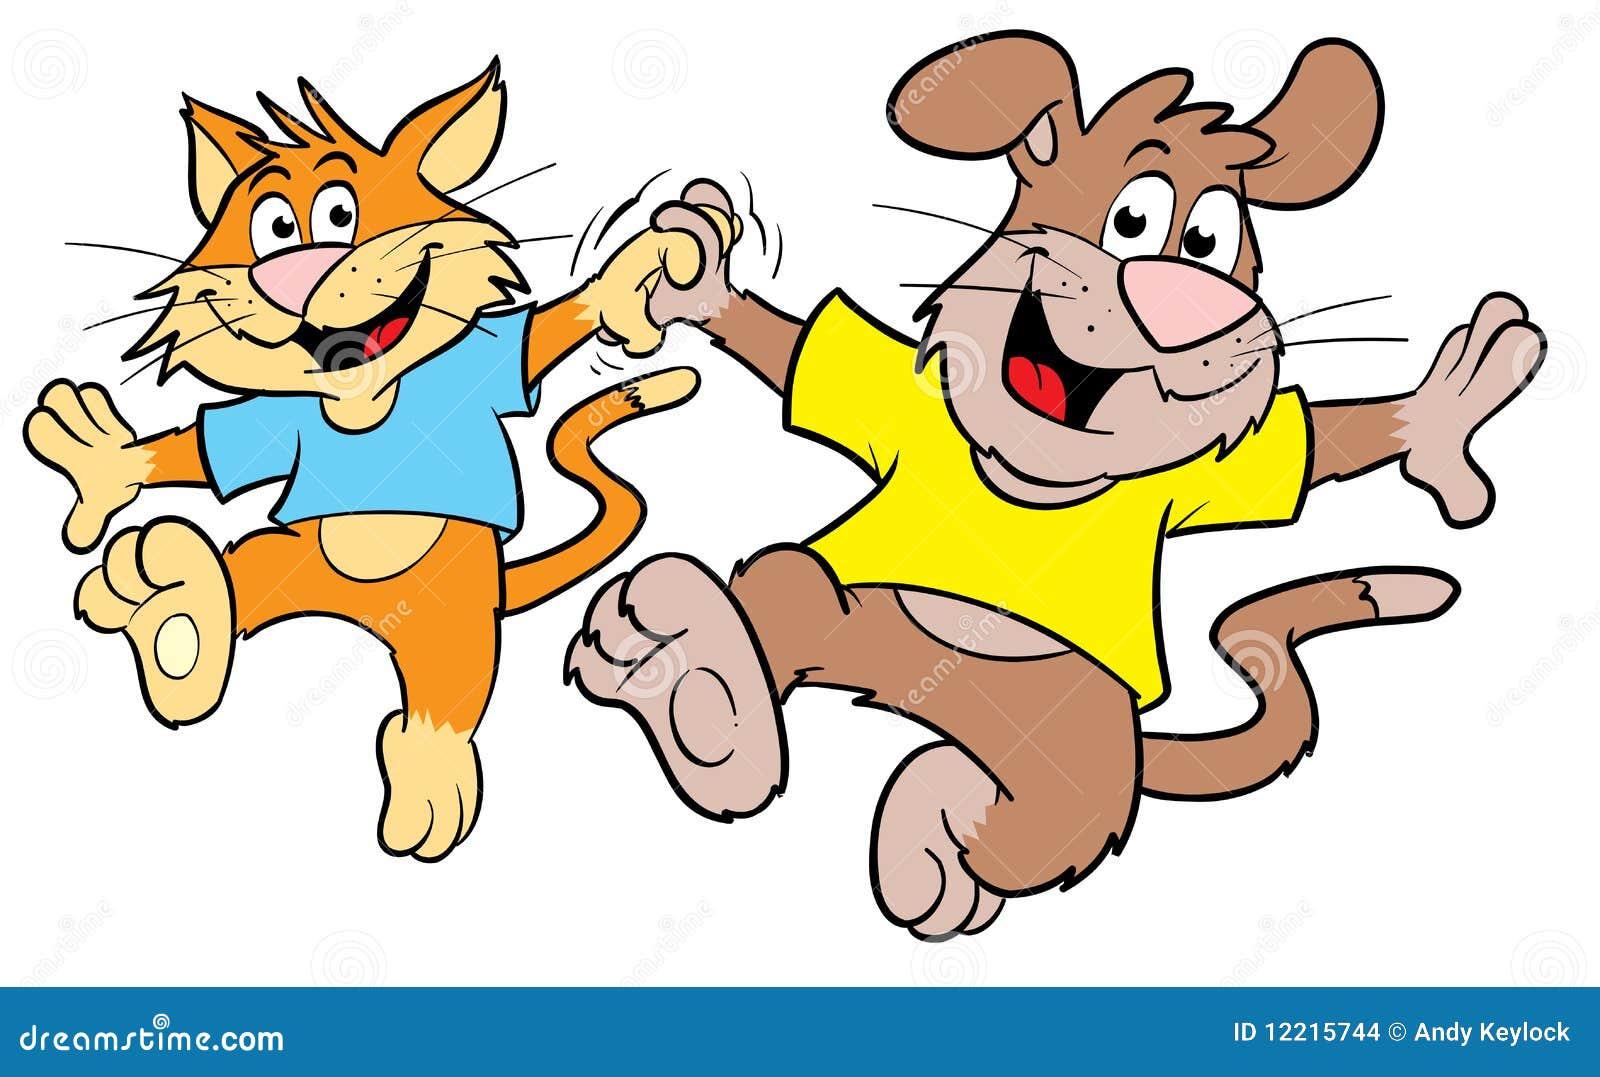 Cute Cartoon Cat And Dog Dancing Stock Illustration ...